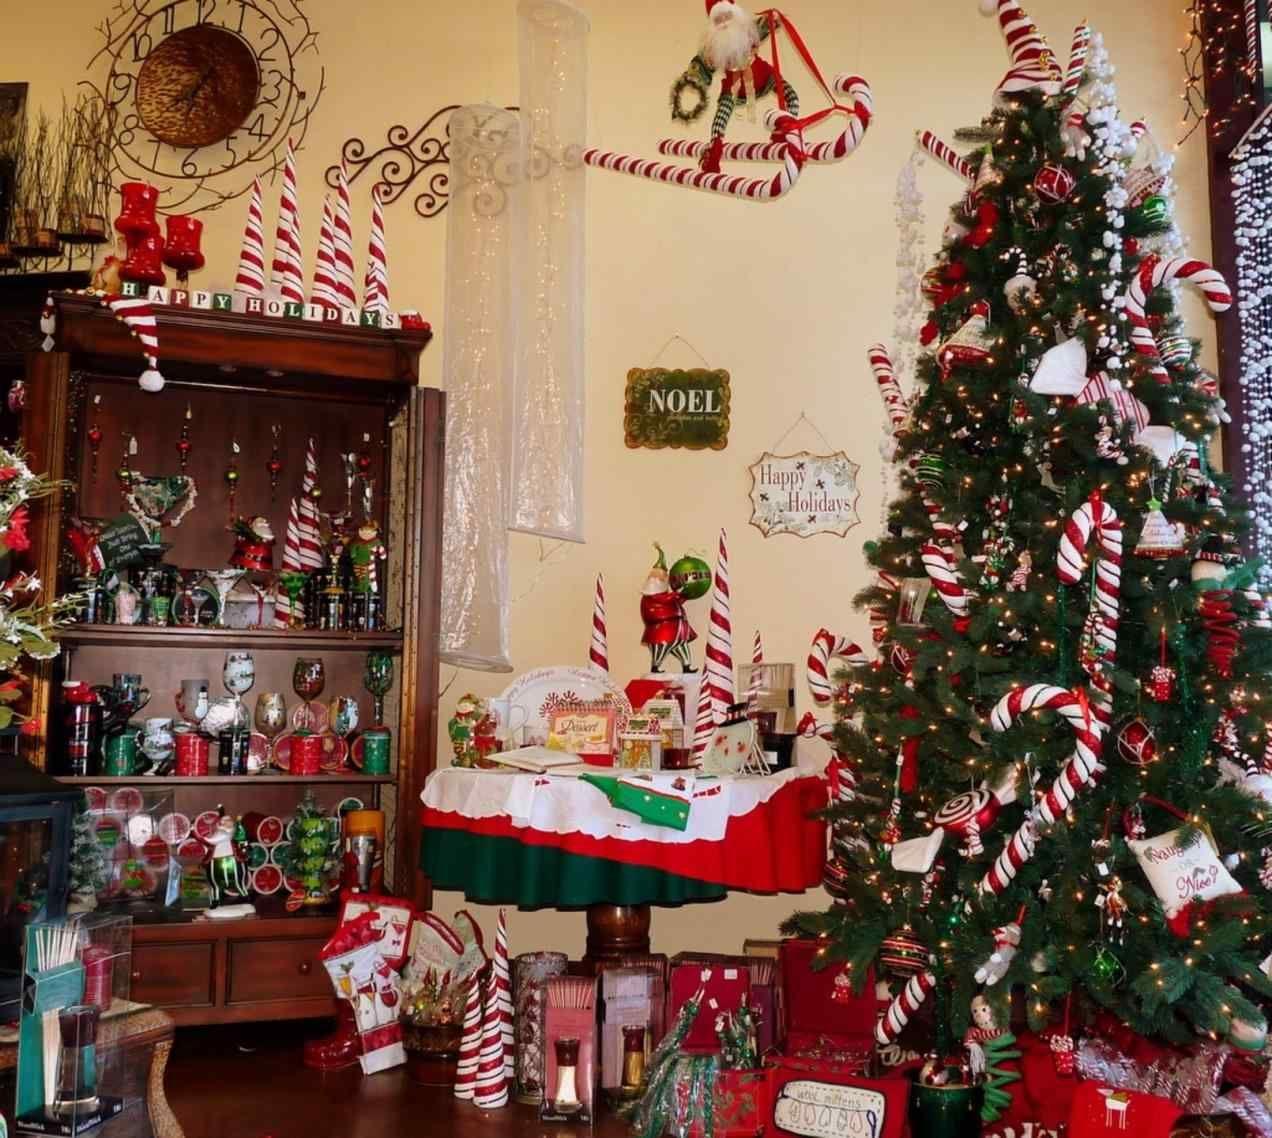 Decorating ideas charming indoor christmas decorations also diy  hacks rh pinterest